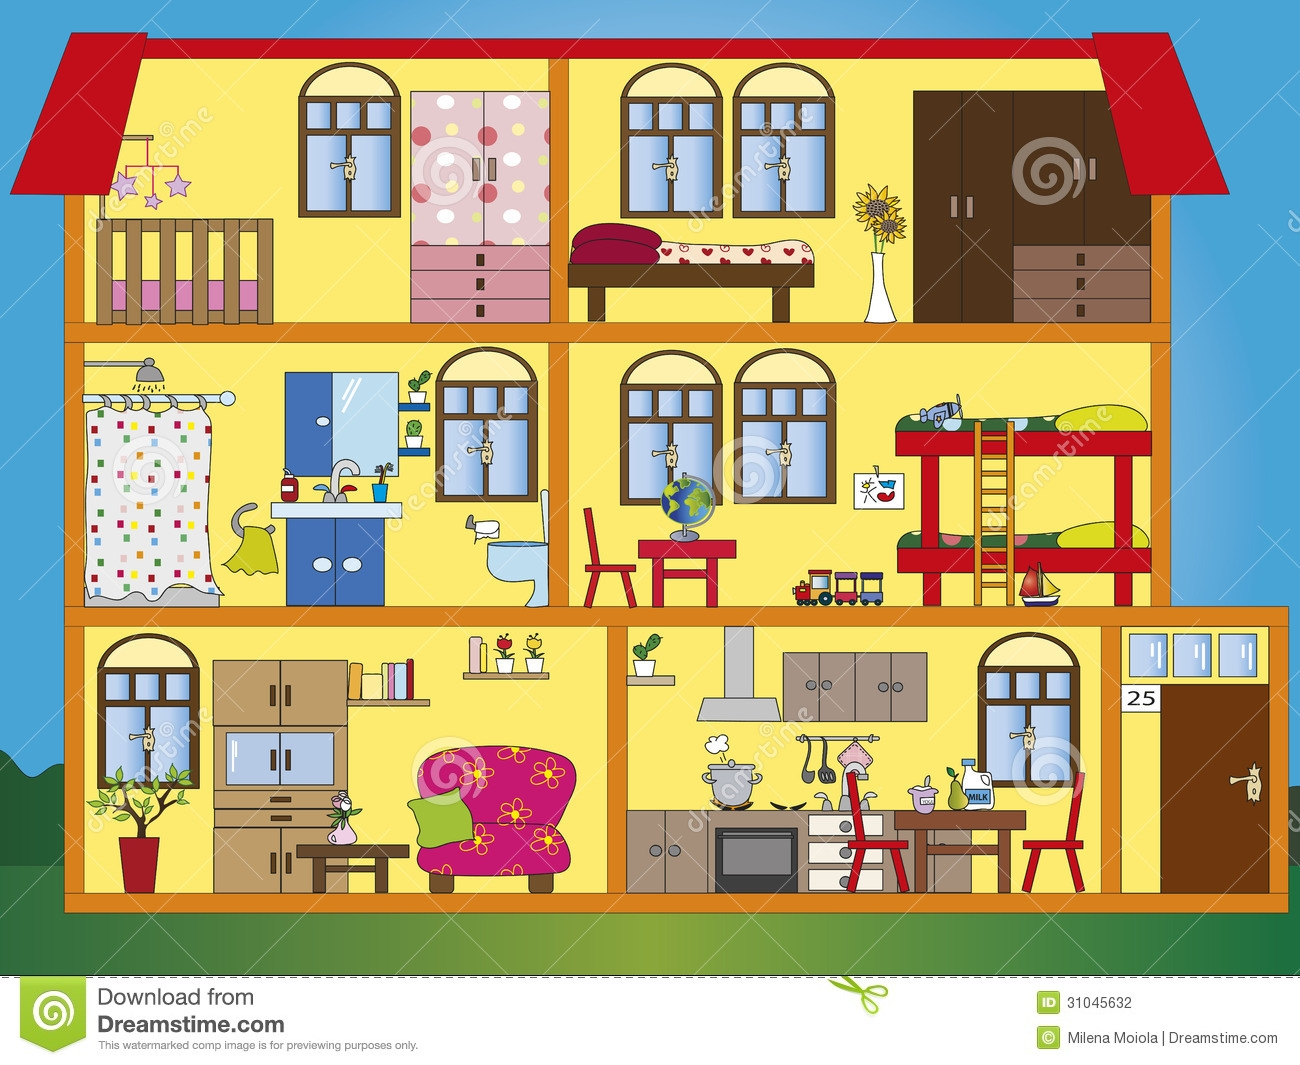 Hosue clipart my house Clip – Interior Clipart House